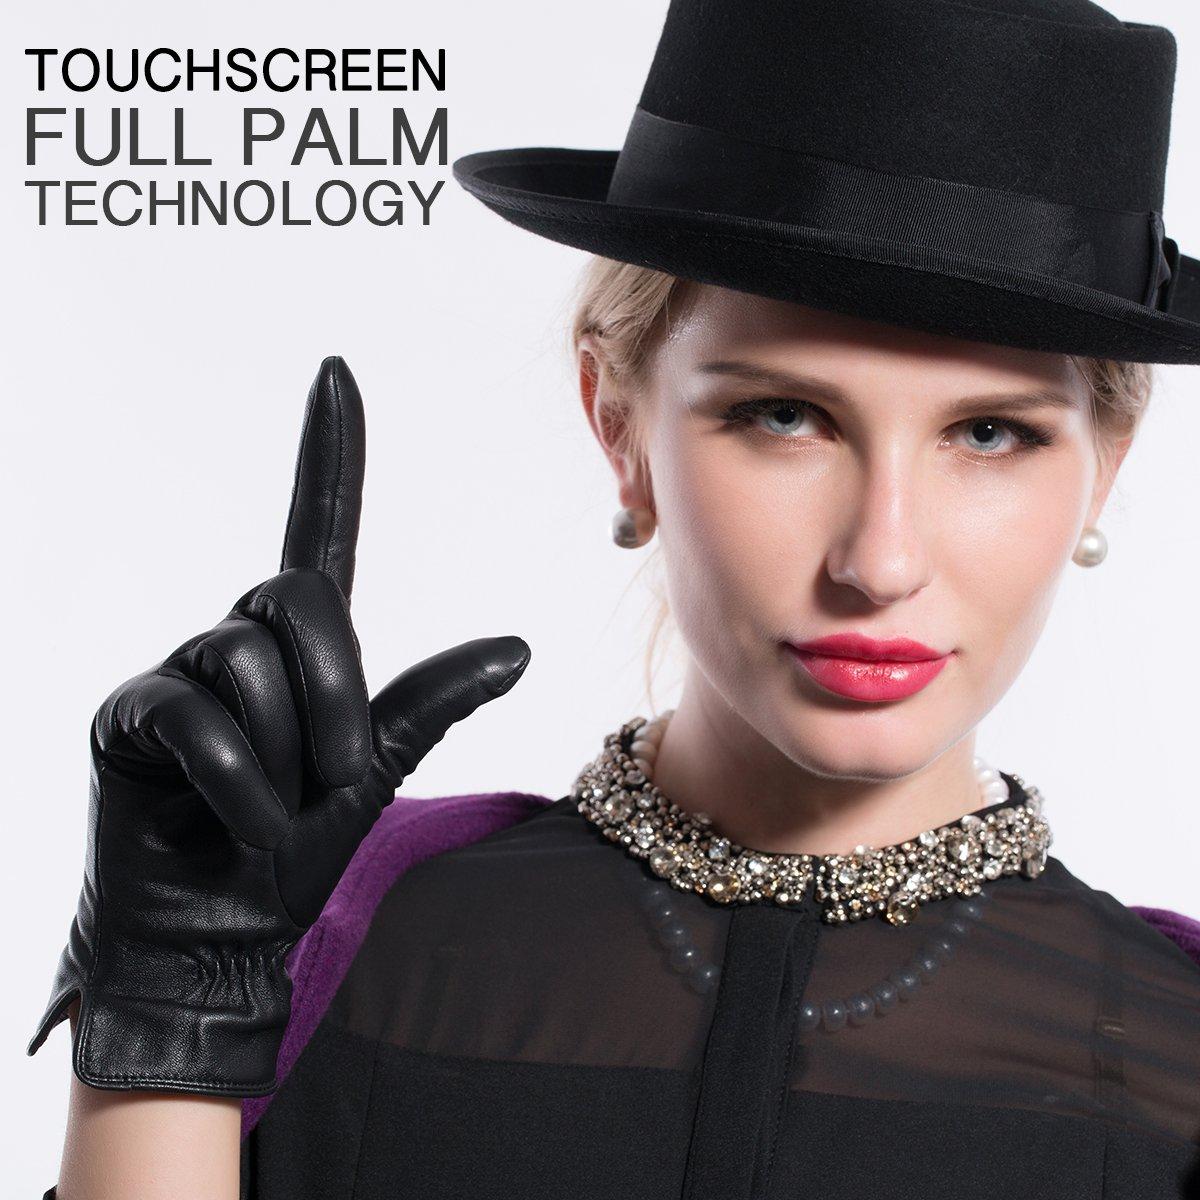 Kursheuel 14 colors Cashmere Women Lady's Genuine lambskin soft leather driving Gloves KU141 (L, Purple) by Kursheuel (Image #9)